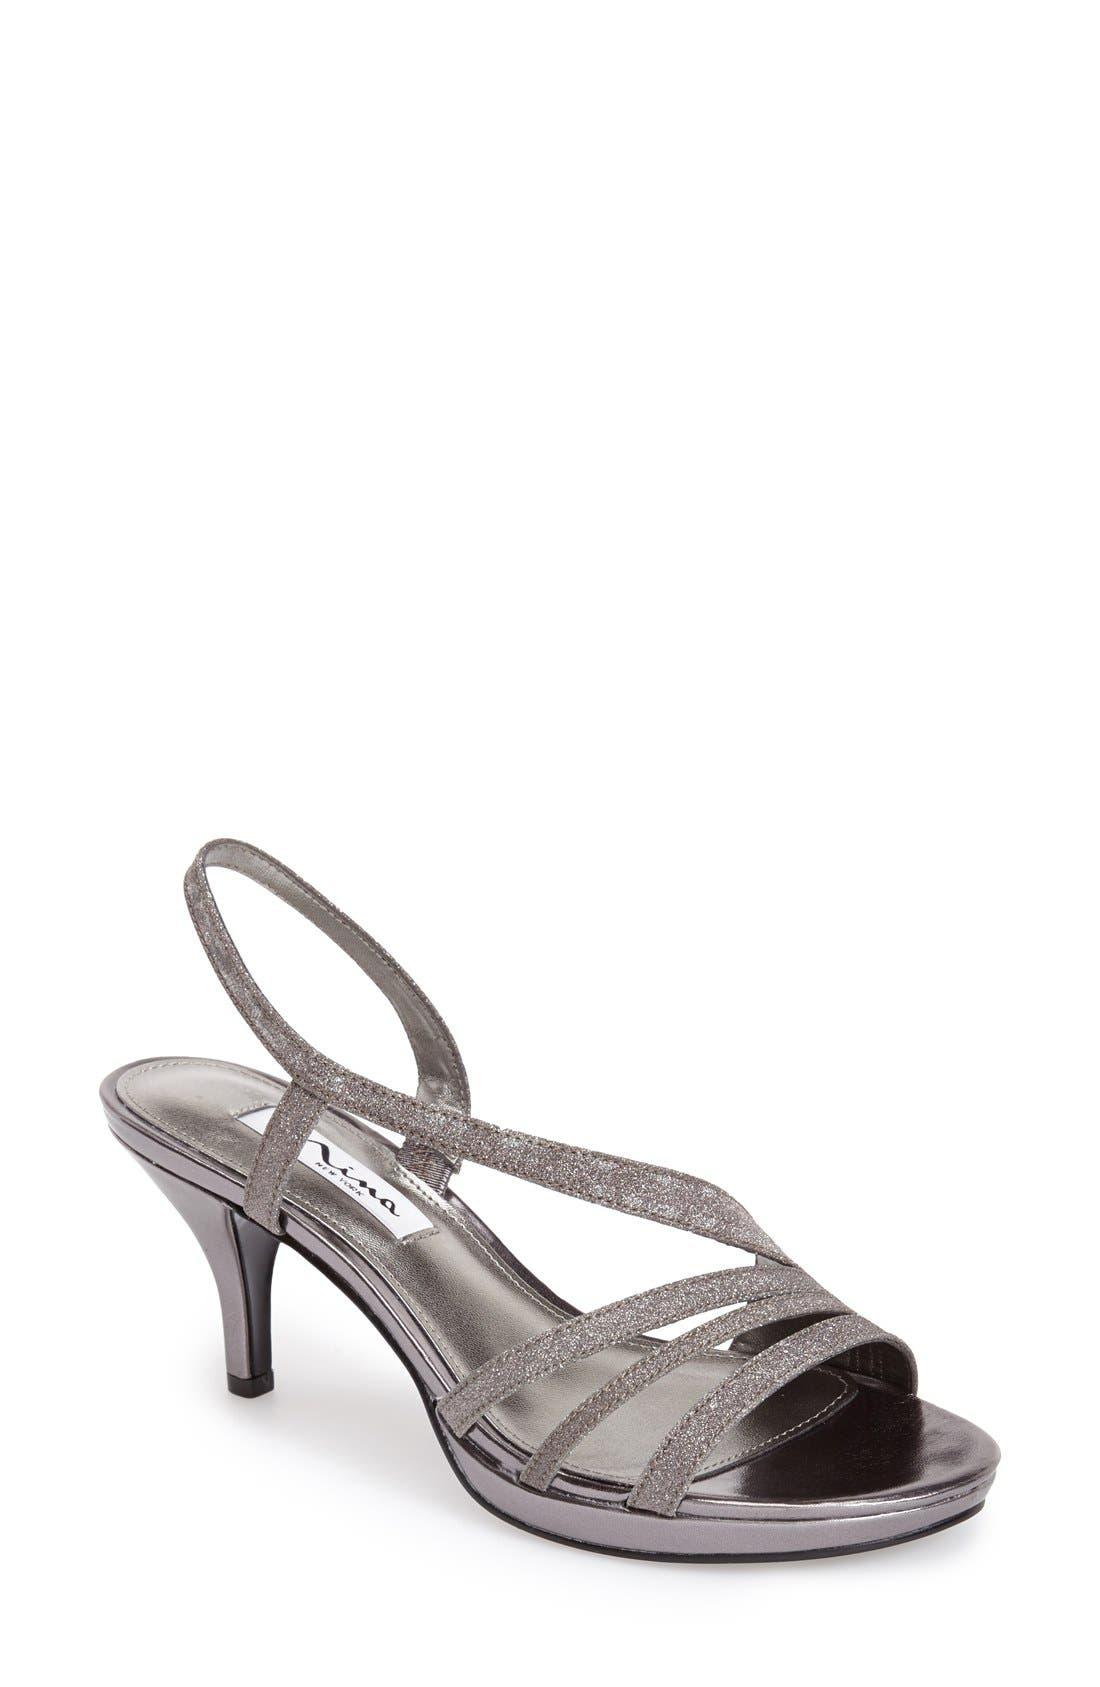 NINA 'Neely' Slingback Platform Sandal, Main, color, CHARCOAL